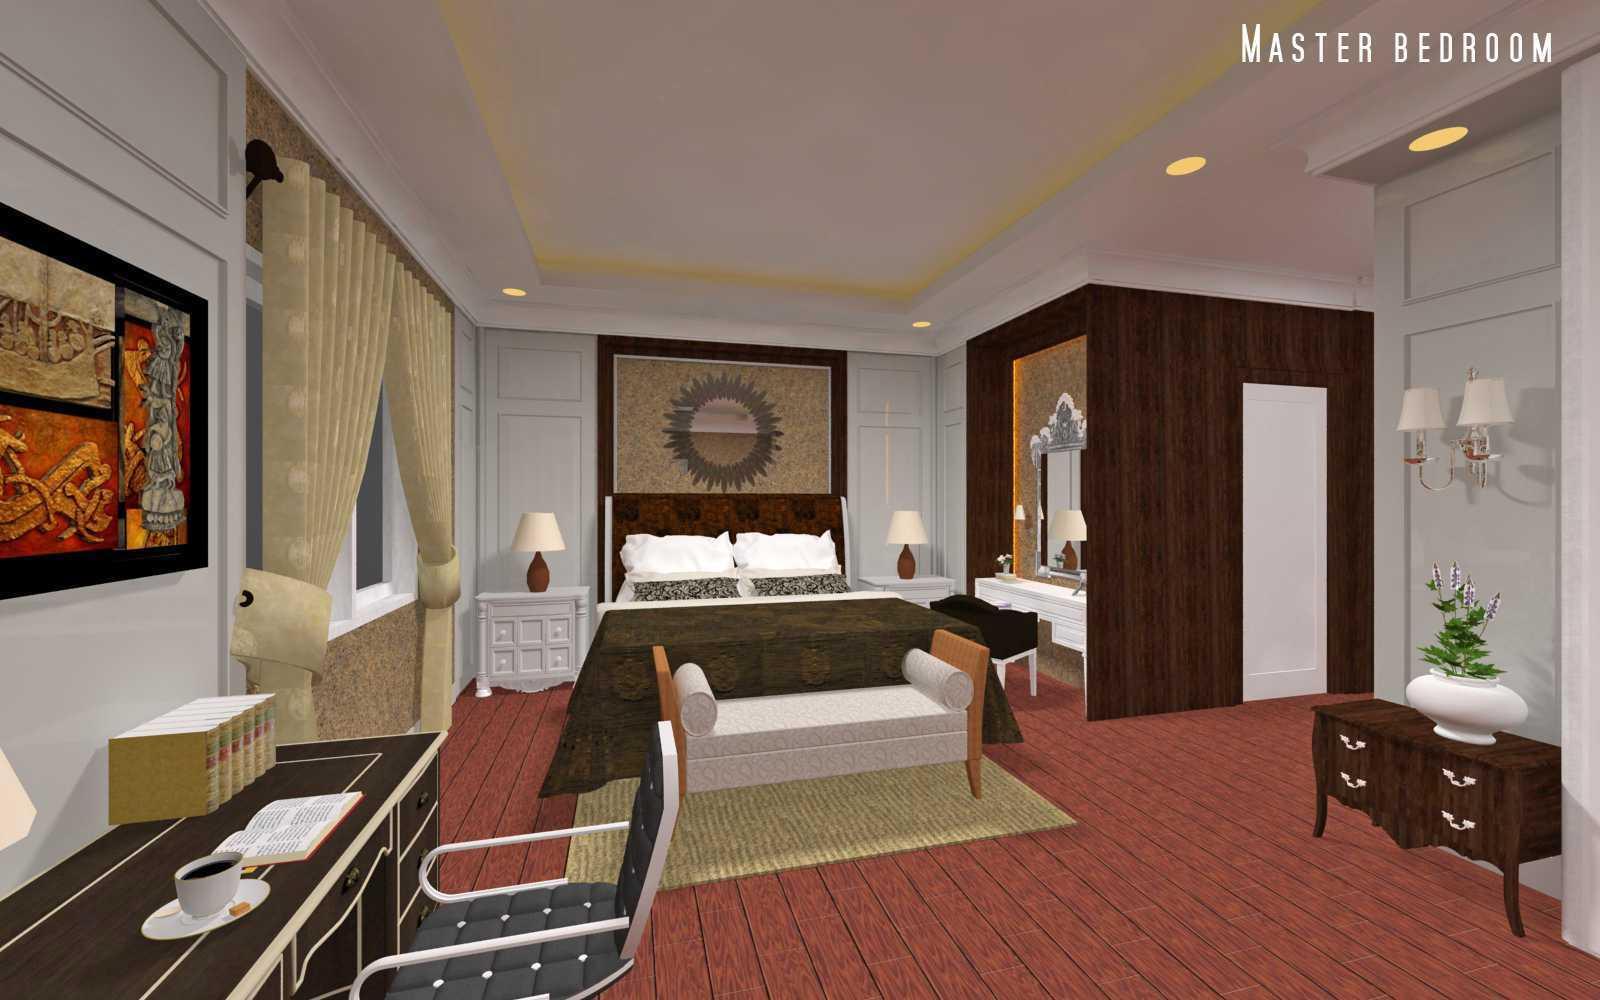 Adi Cipta Estetika Classic Interiors Design Medan Medan Master Bedroom Klasik  20041